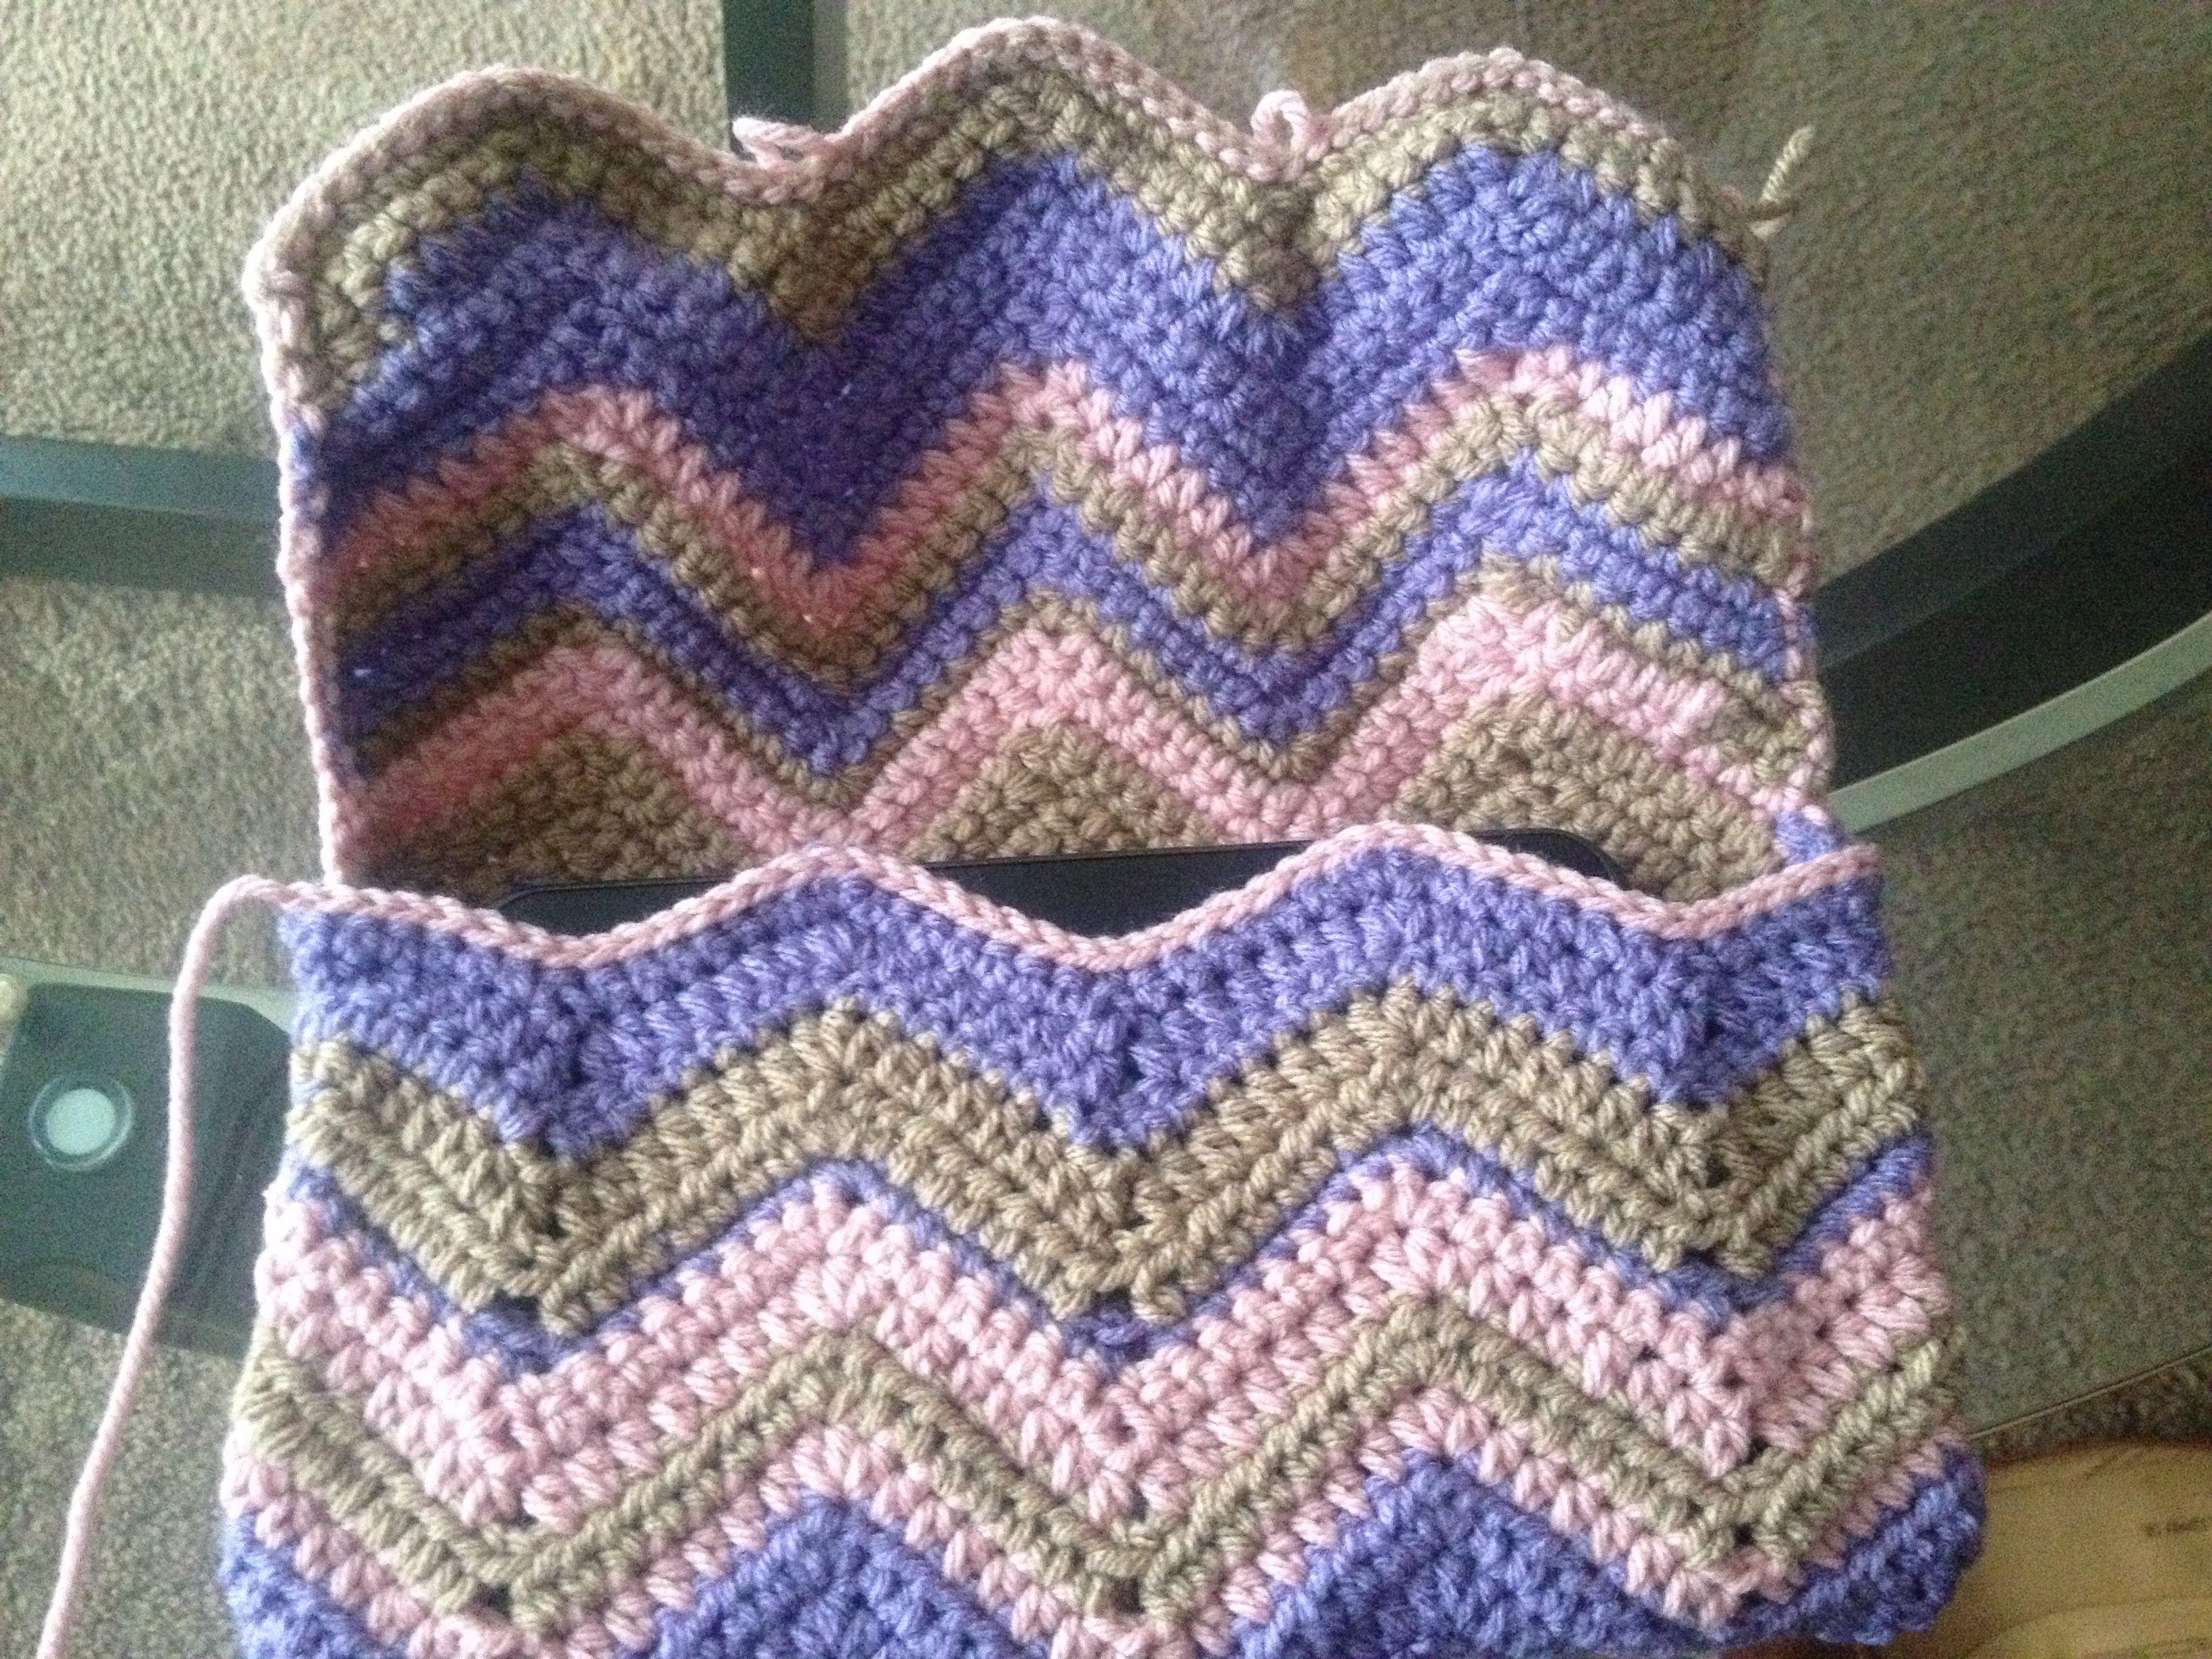 Chevron Crochet tablet case by Risqué Crochet